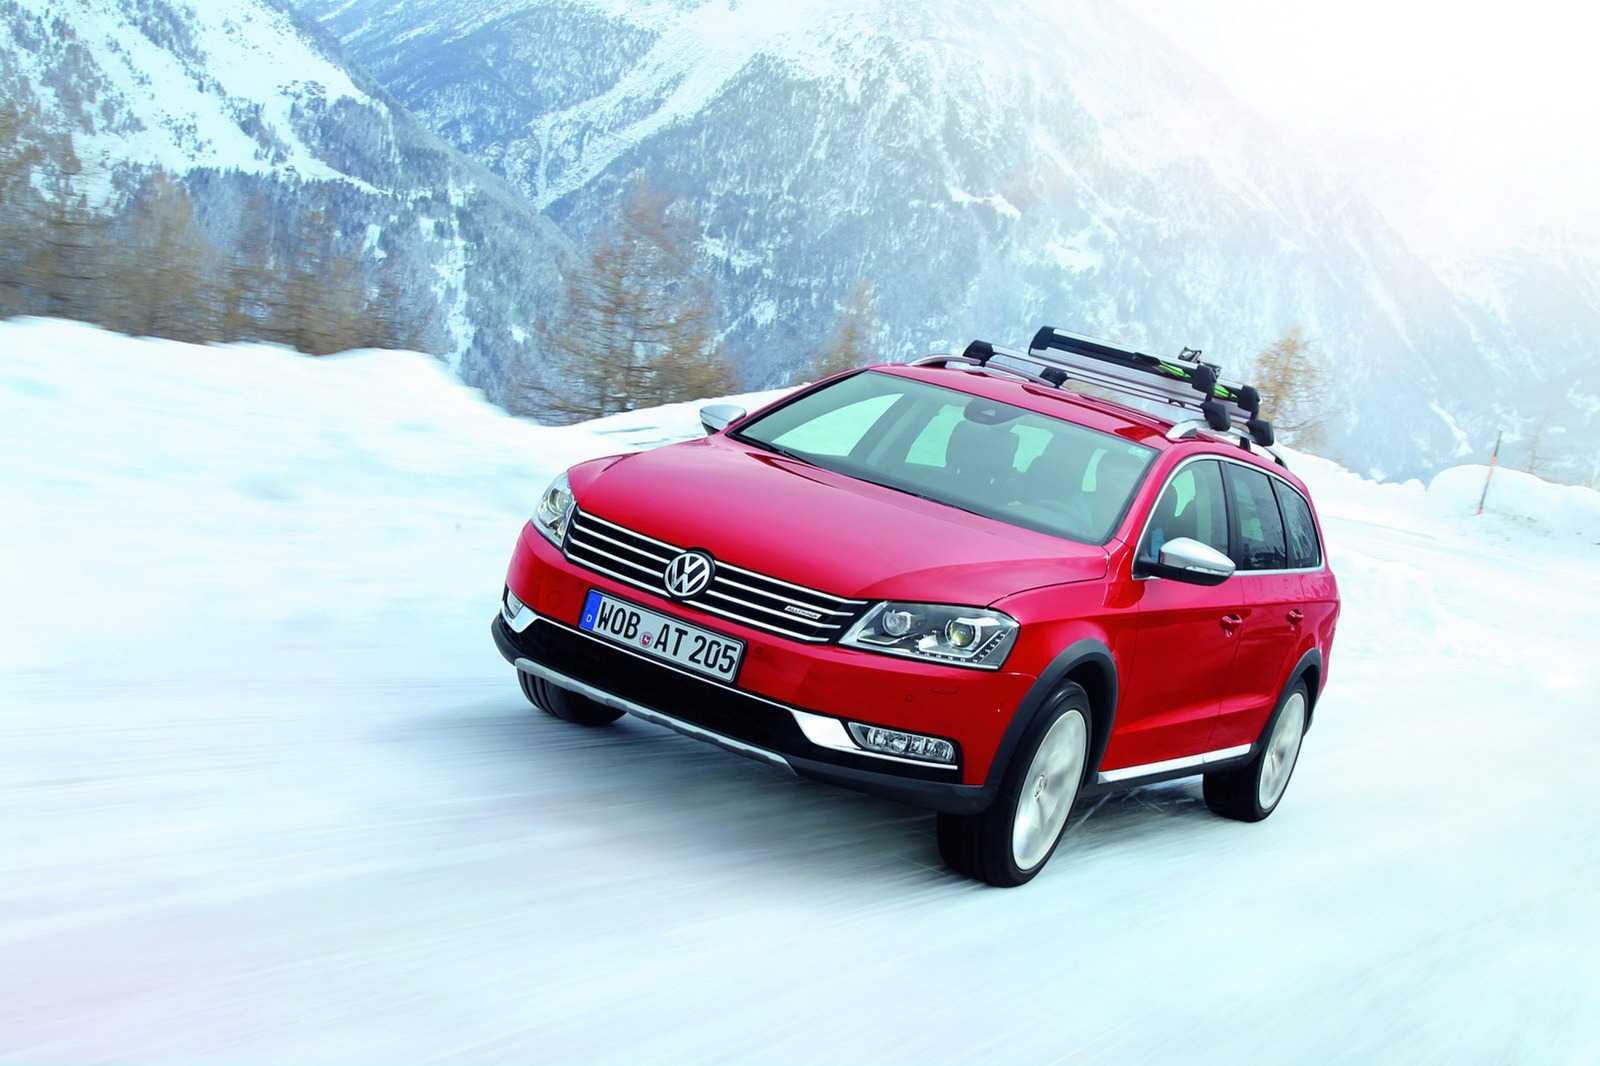 Обзор комплектации volkswagen passat b8 trendline, отличия и особенности